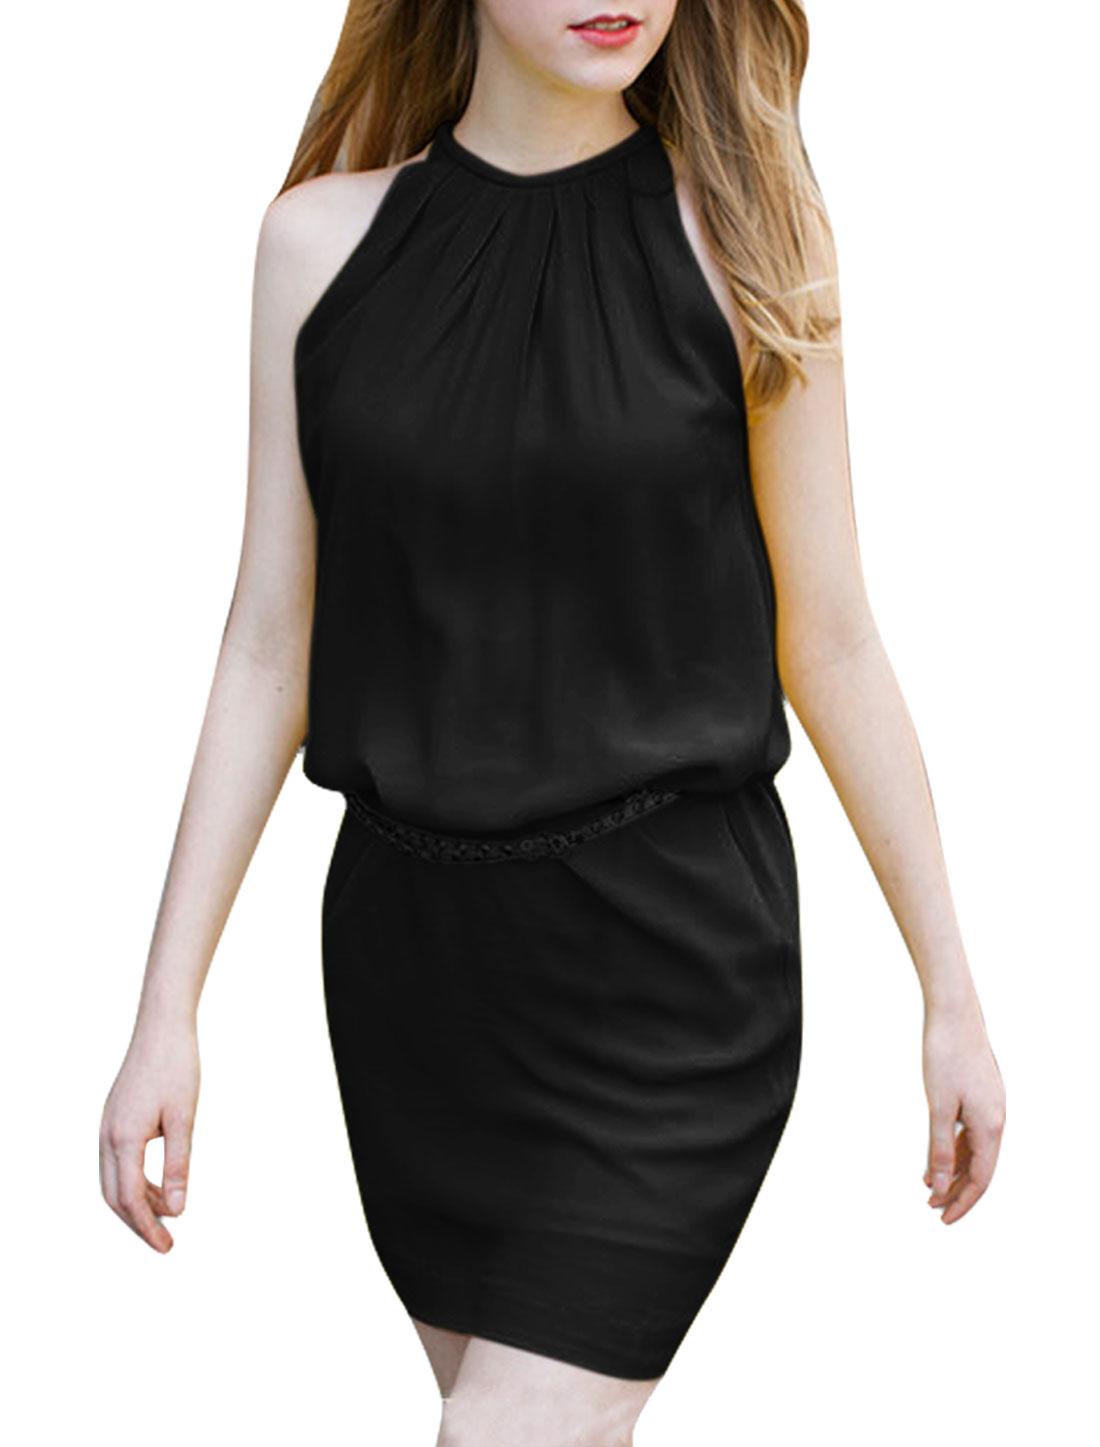 Women Halter Neck Zip Up Back Belt Dress Black M